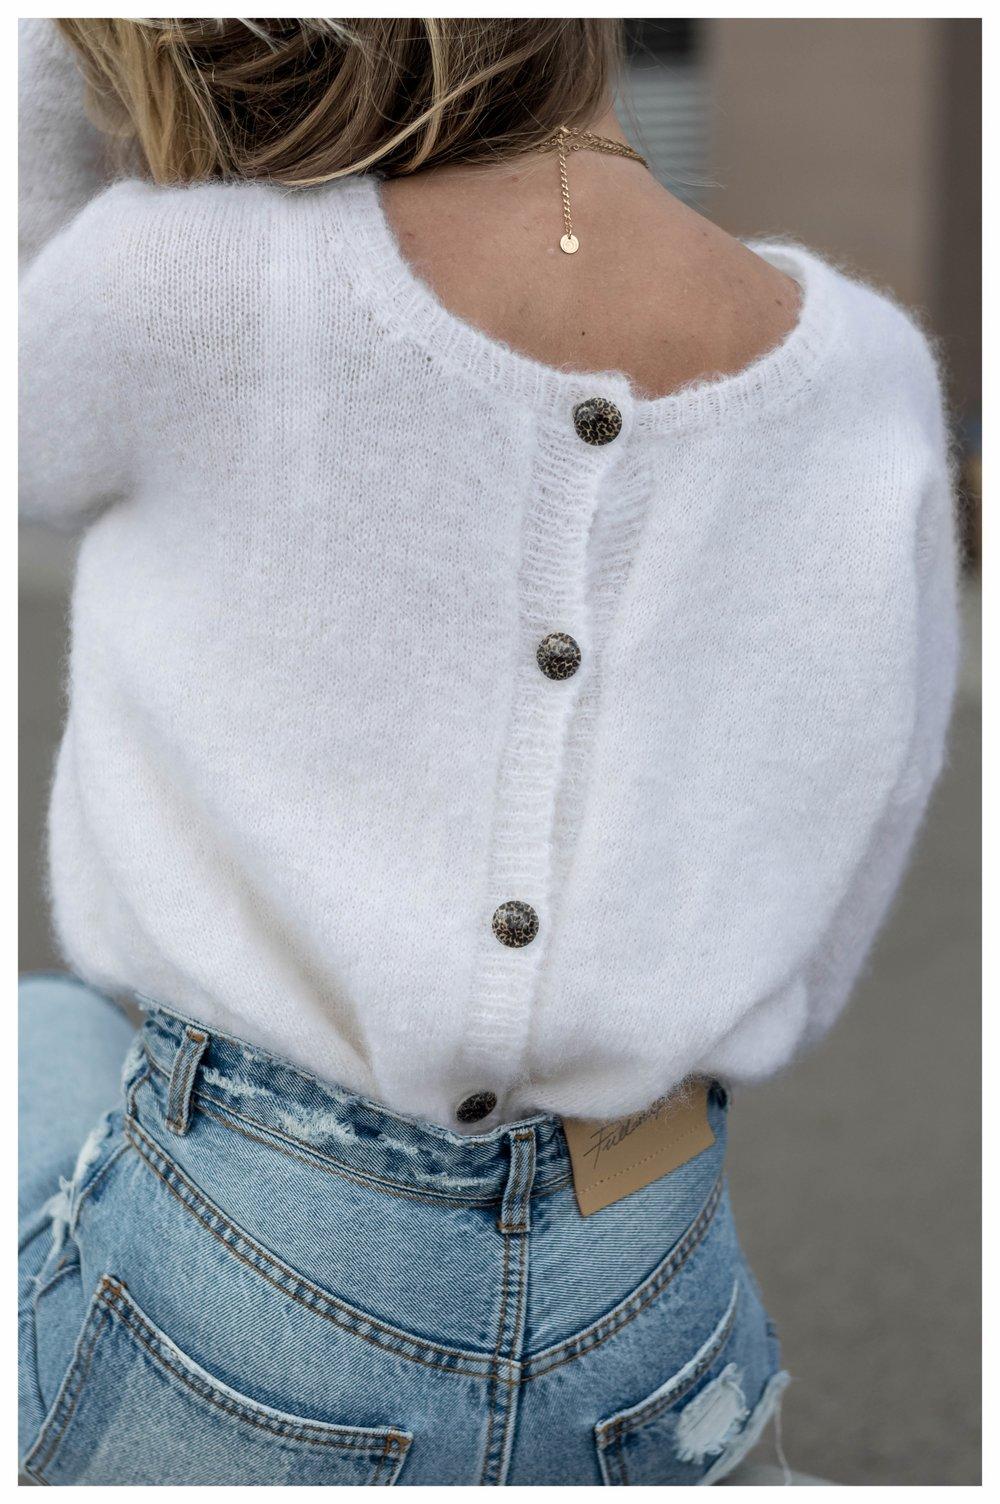 High Jeans - OSIARAH.COM (15 sur 21).jpg